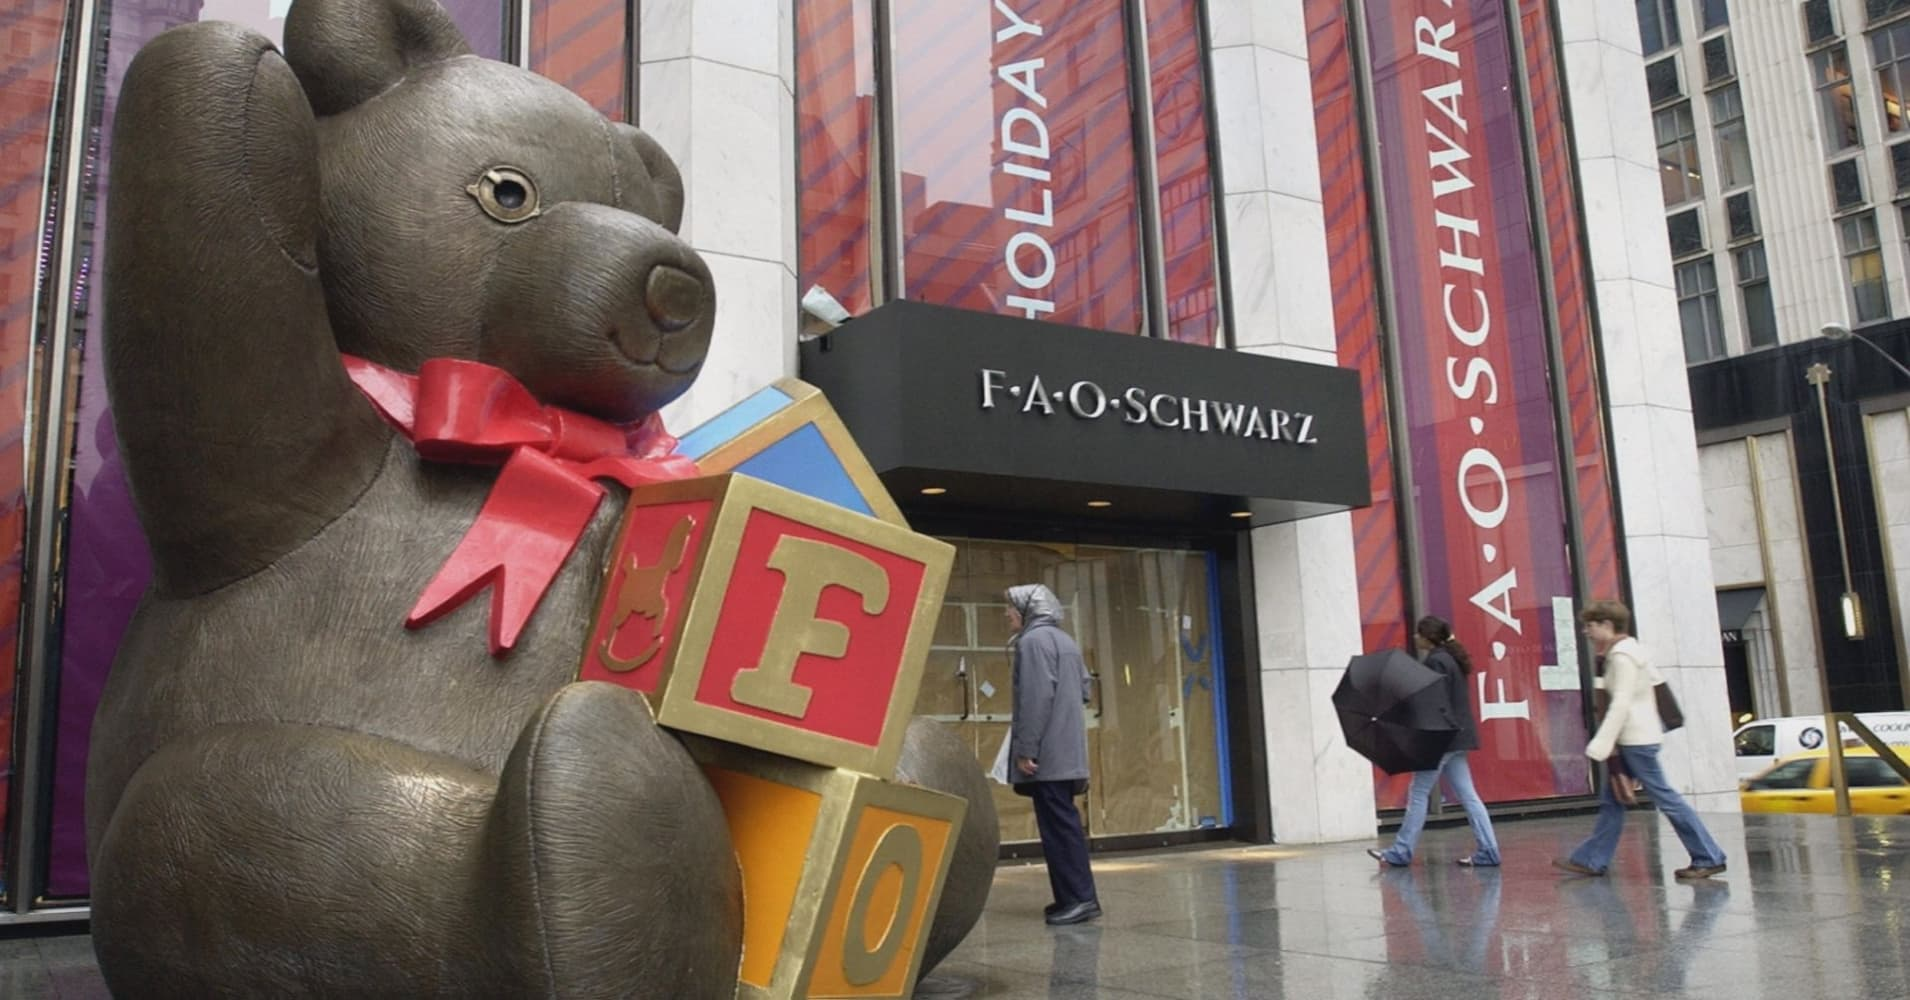 Iconic toy store FAO Schwarz returns to New York City